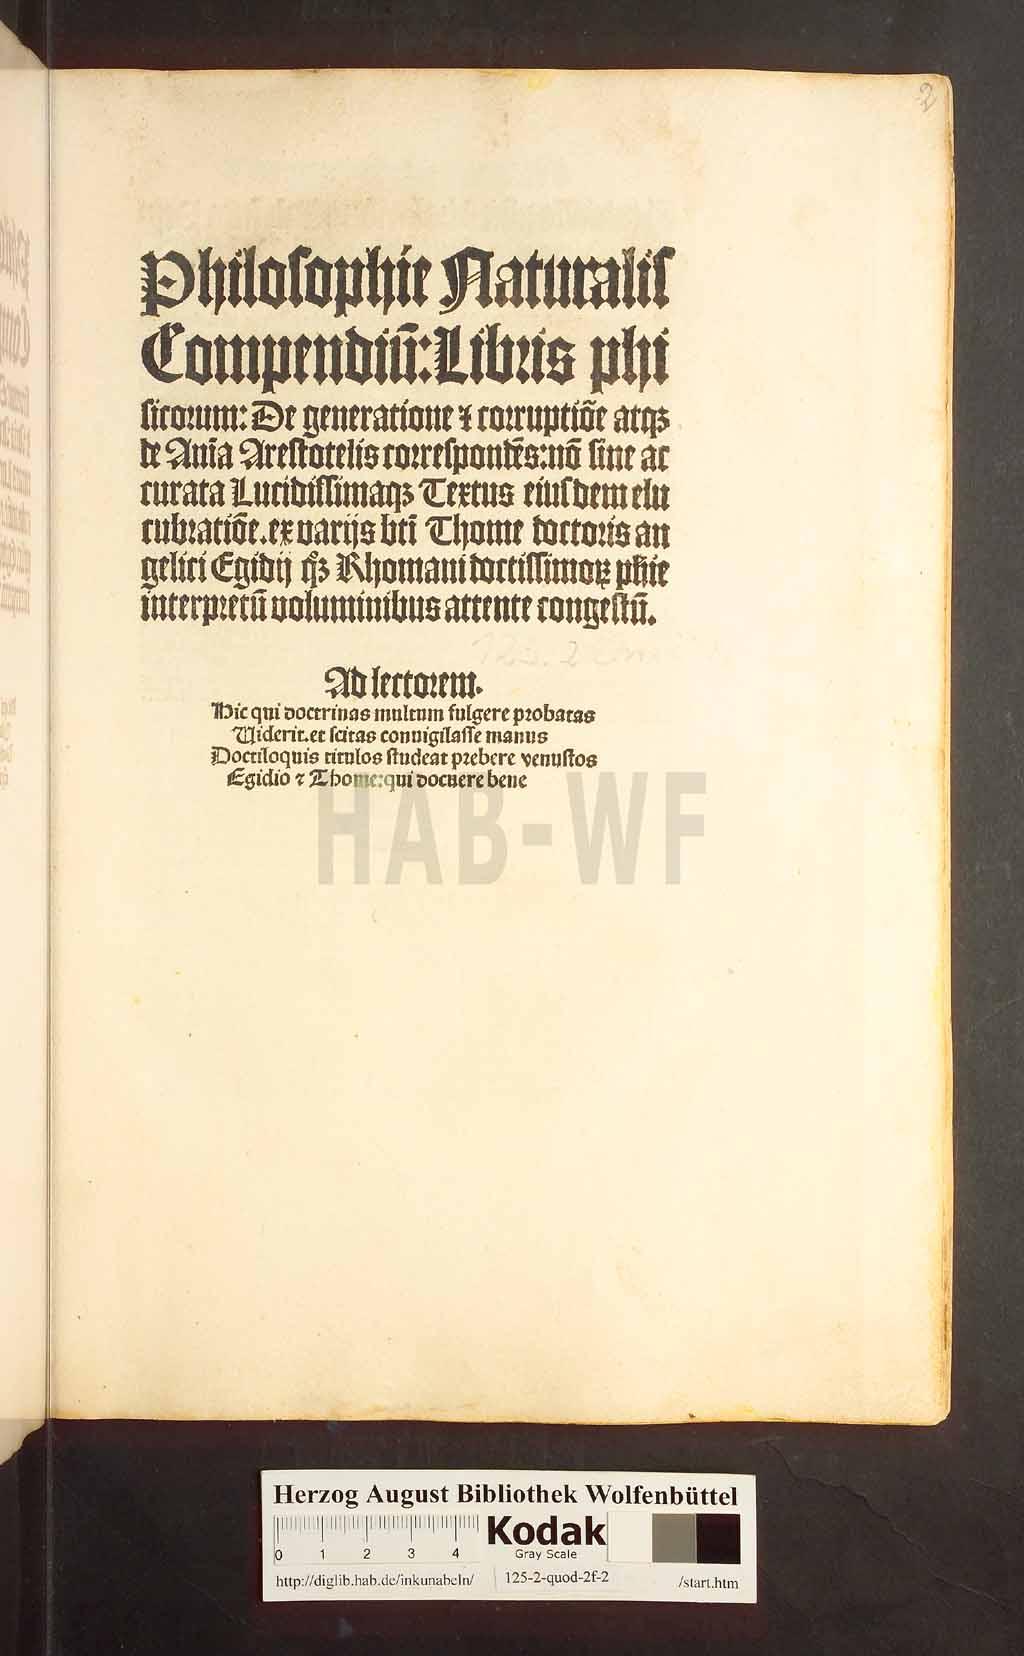 https://diglib.hab.de/inkunabeln/125-2-quod-2f-2/00001.jpg